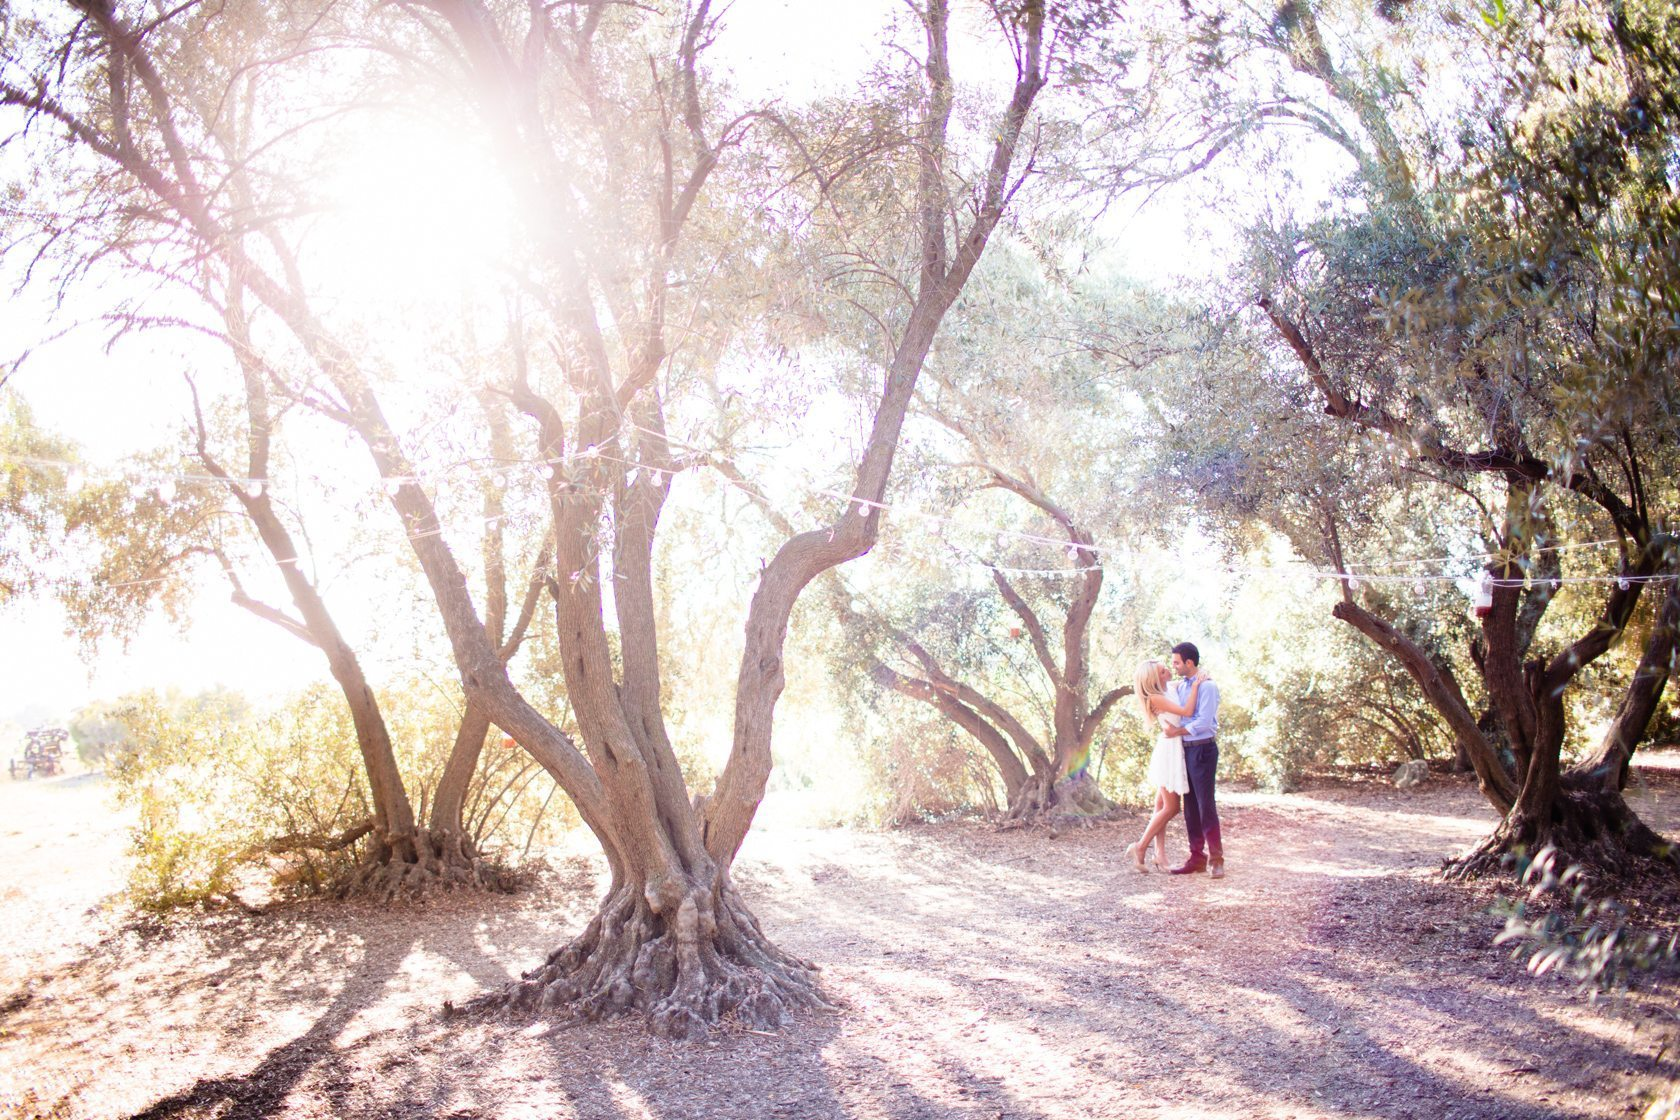 Highland_Springs_Lavender_Field_Engagement_15.jpg